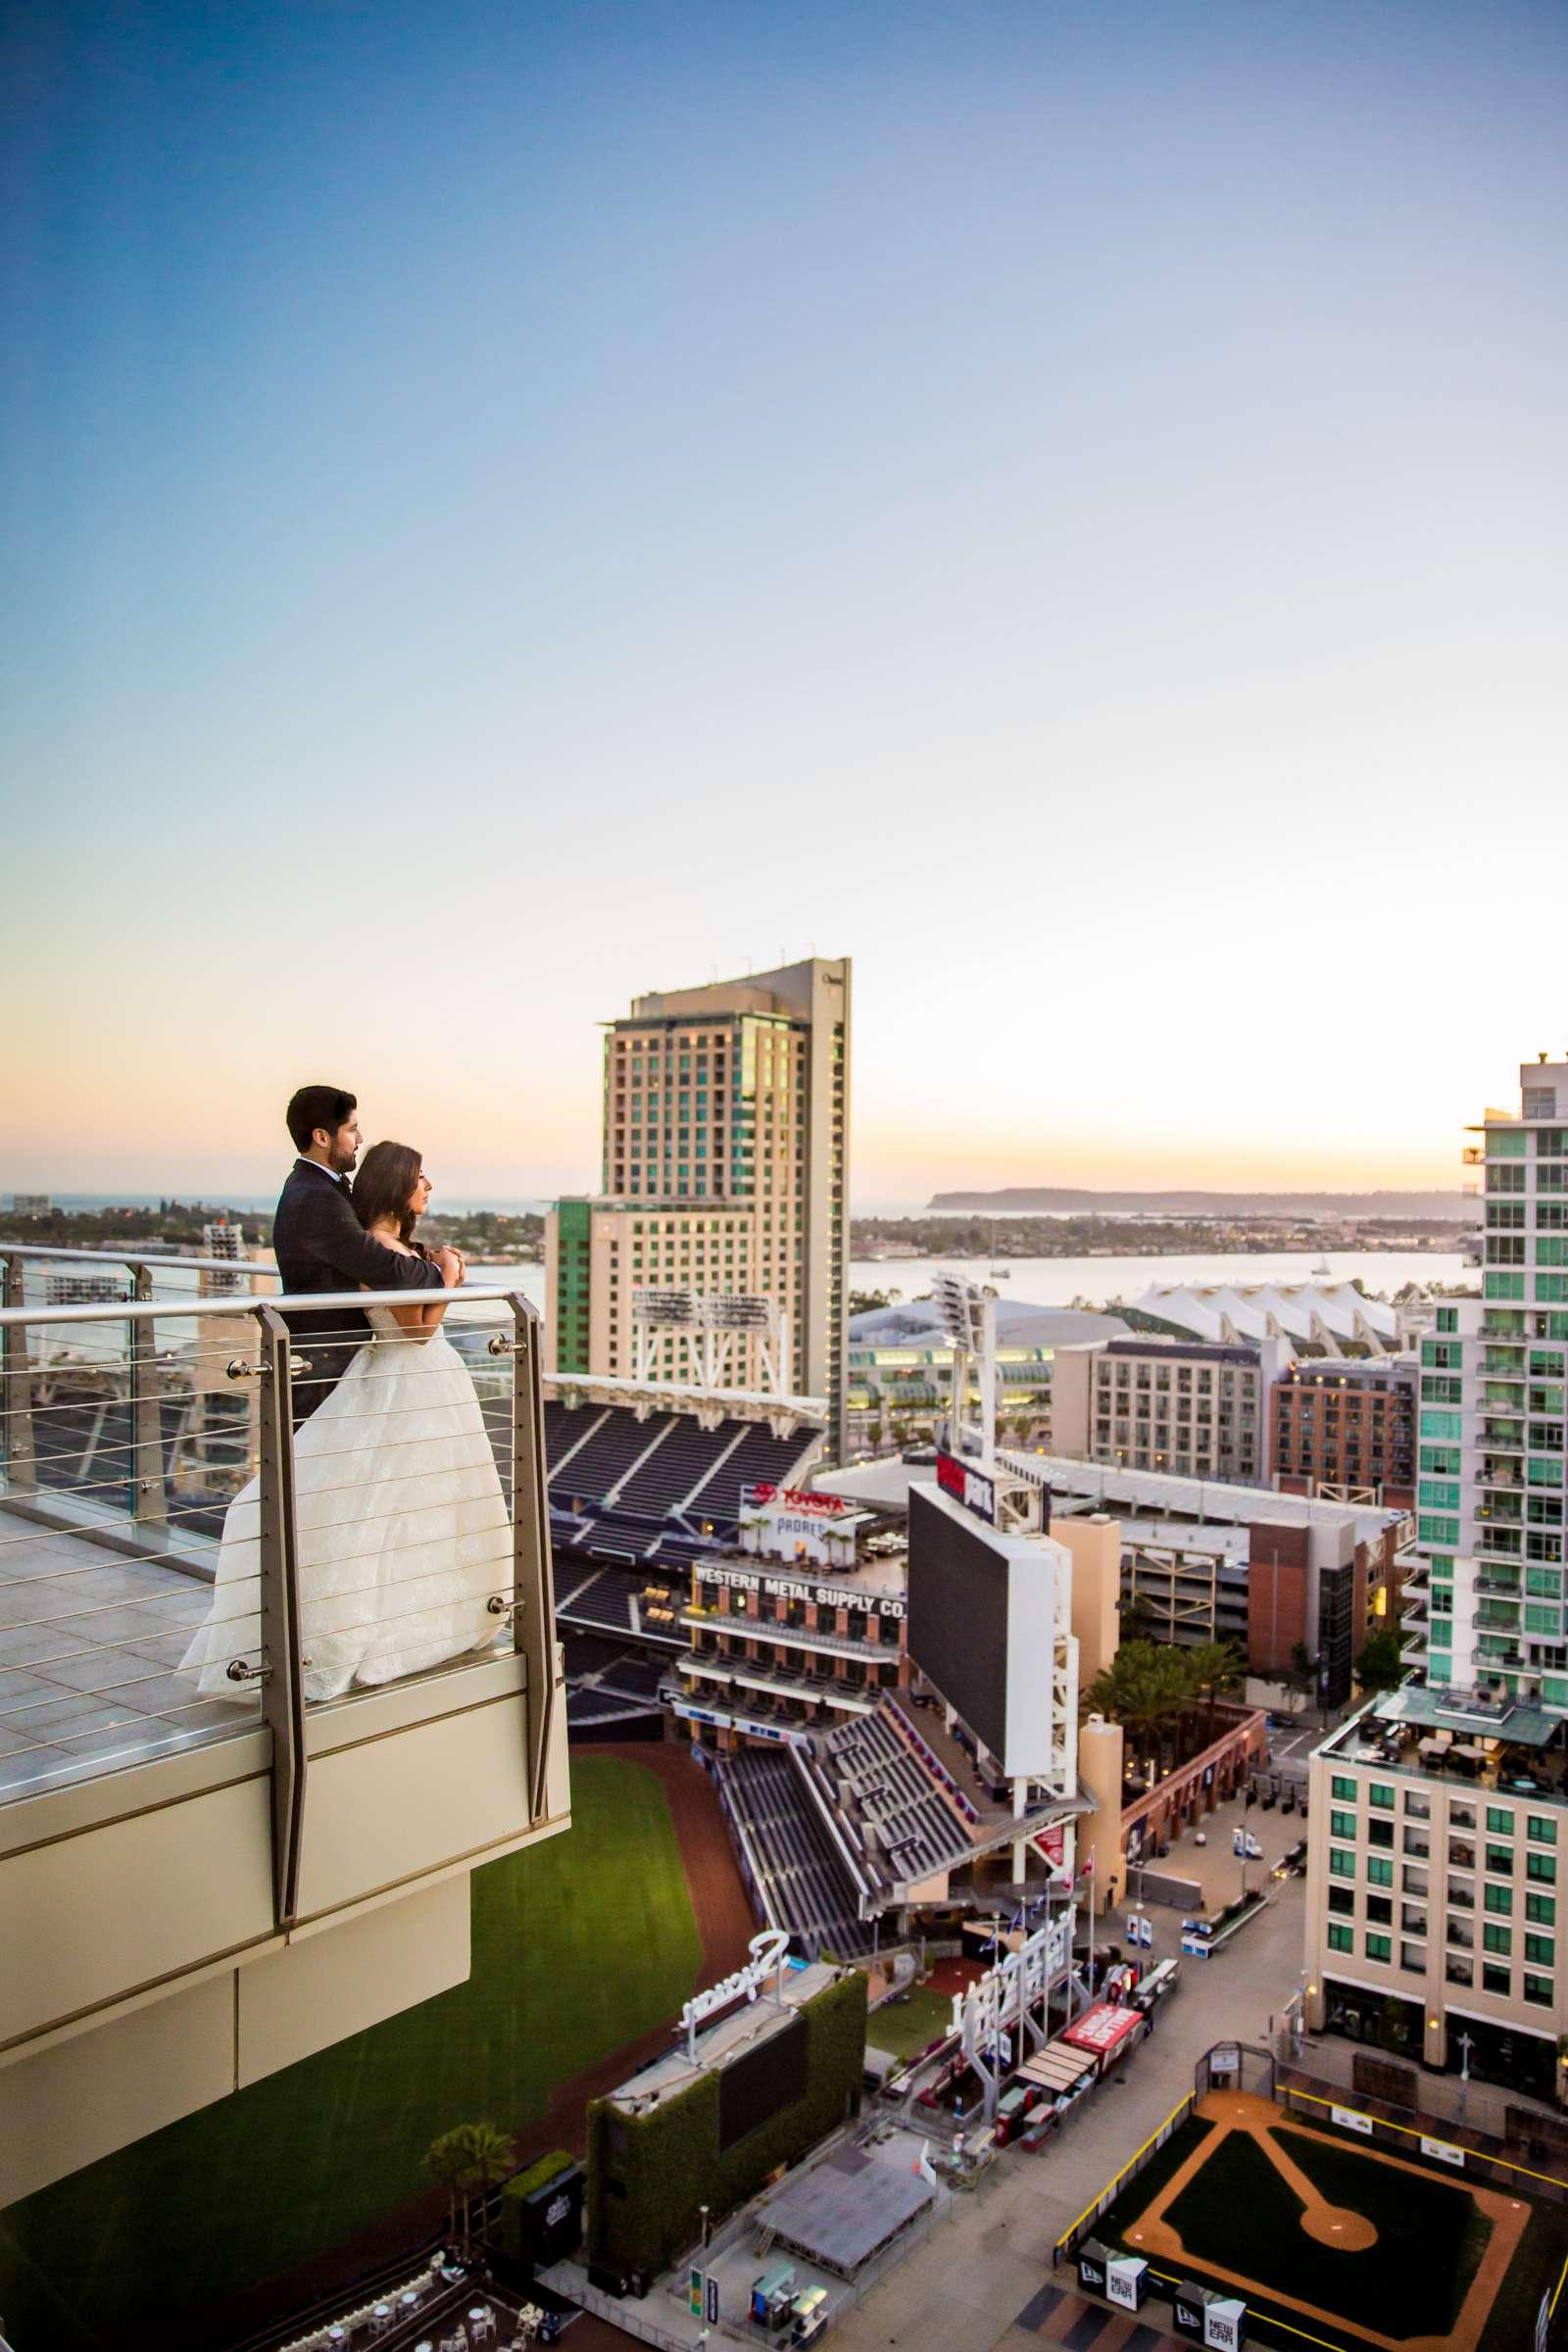 Ultimate Skybox | San Diego Photographer - True Photography